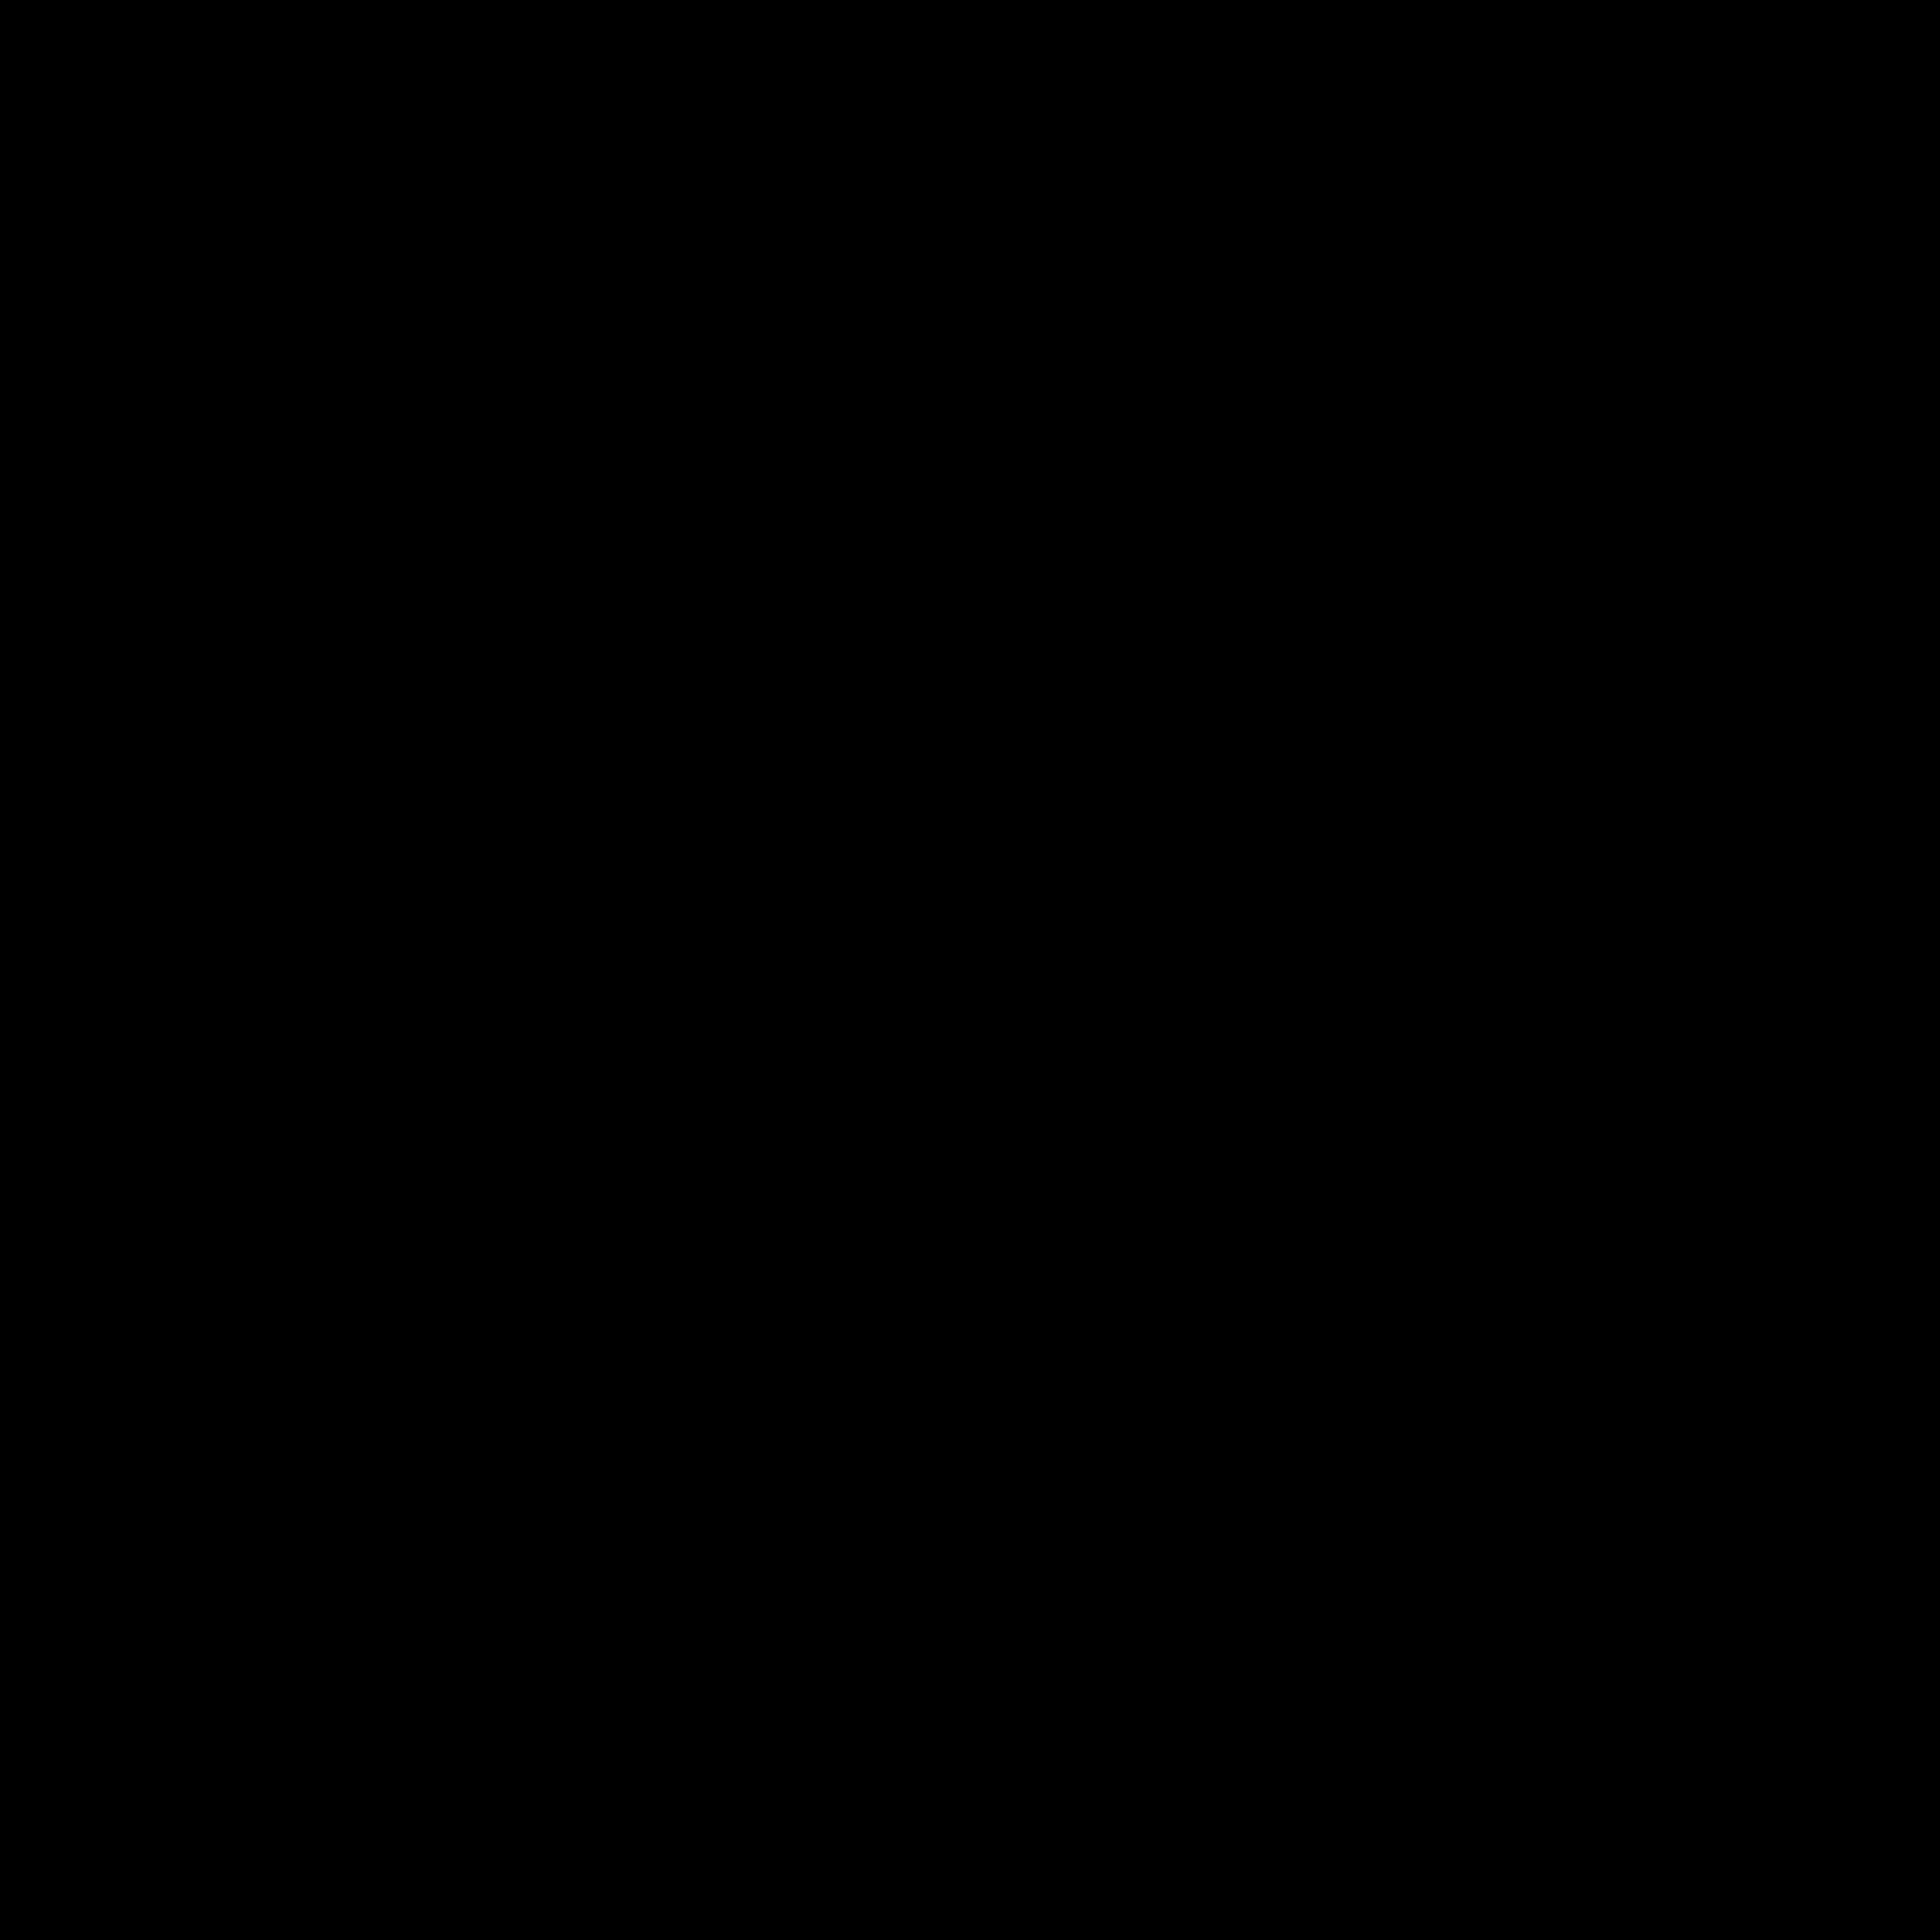 Imagini pentru logo adobe INDESIGN